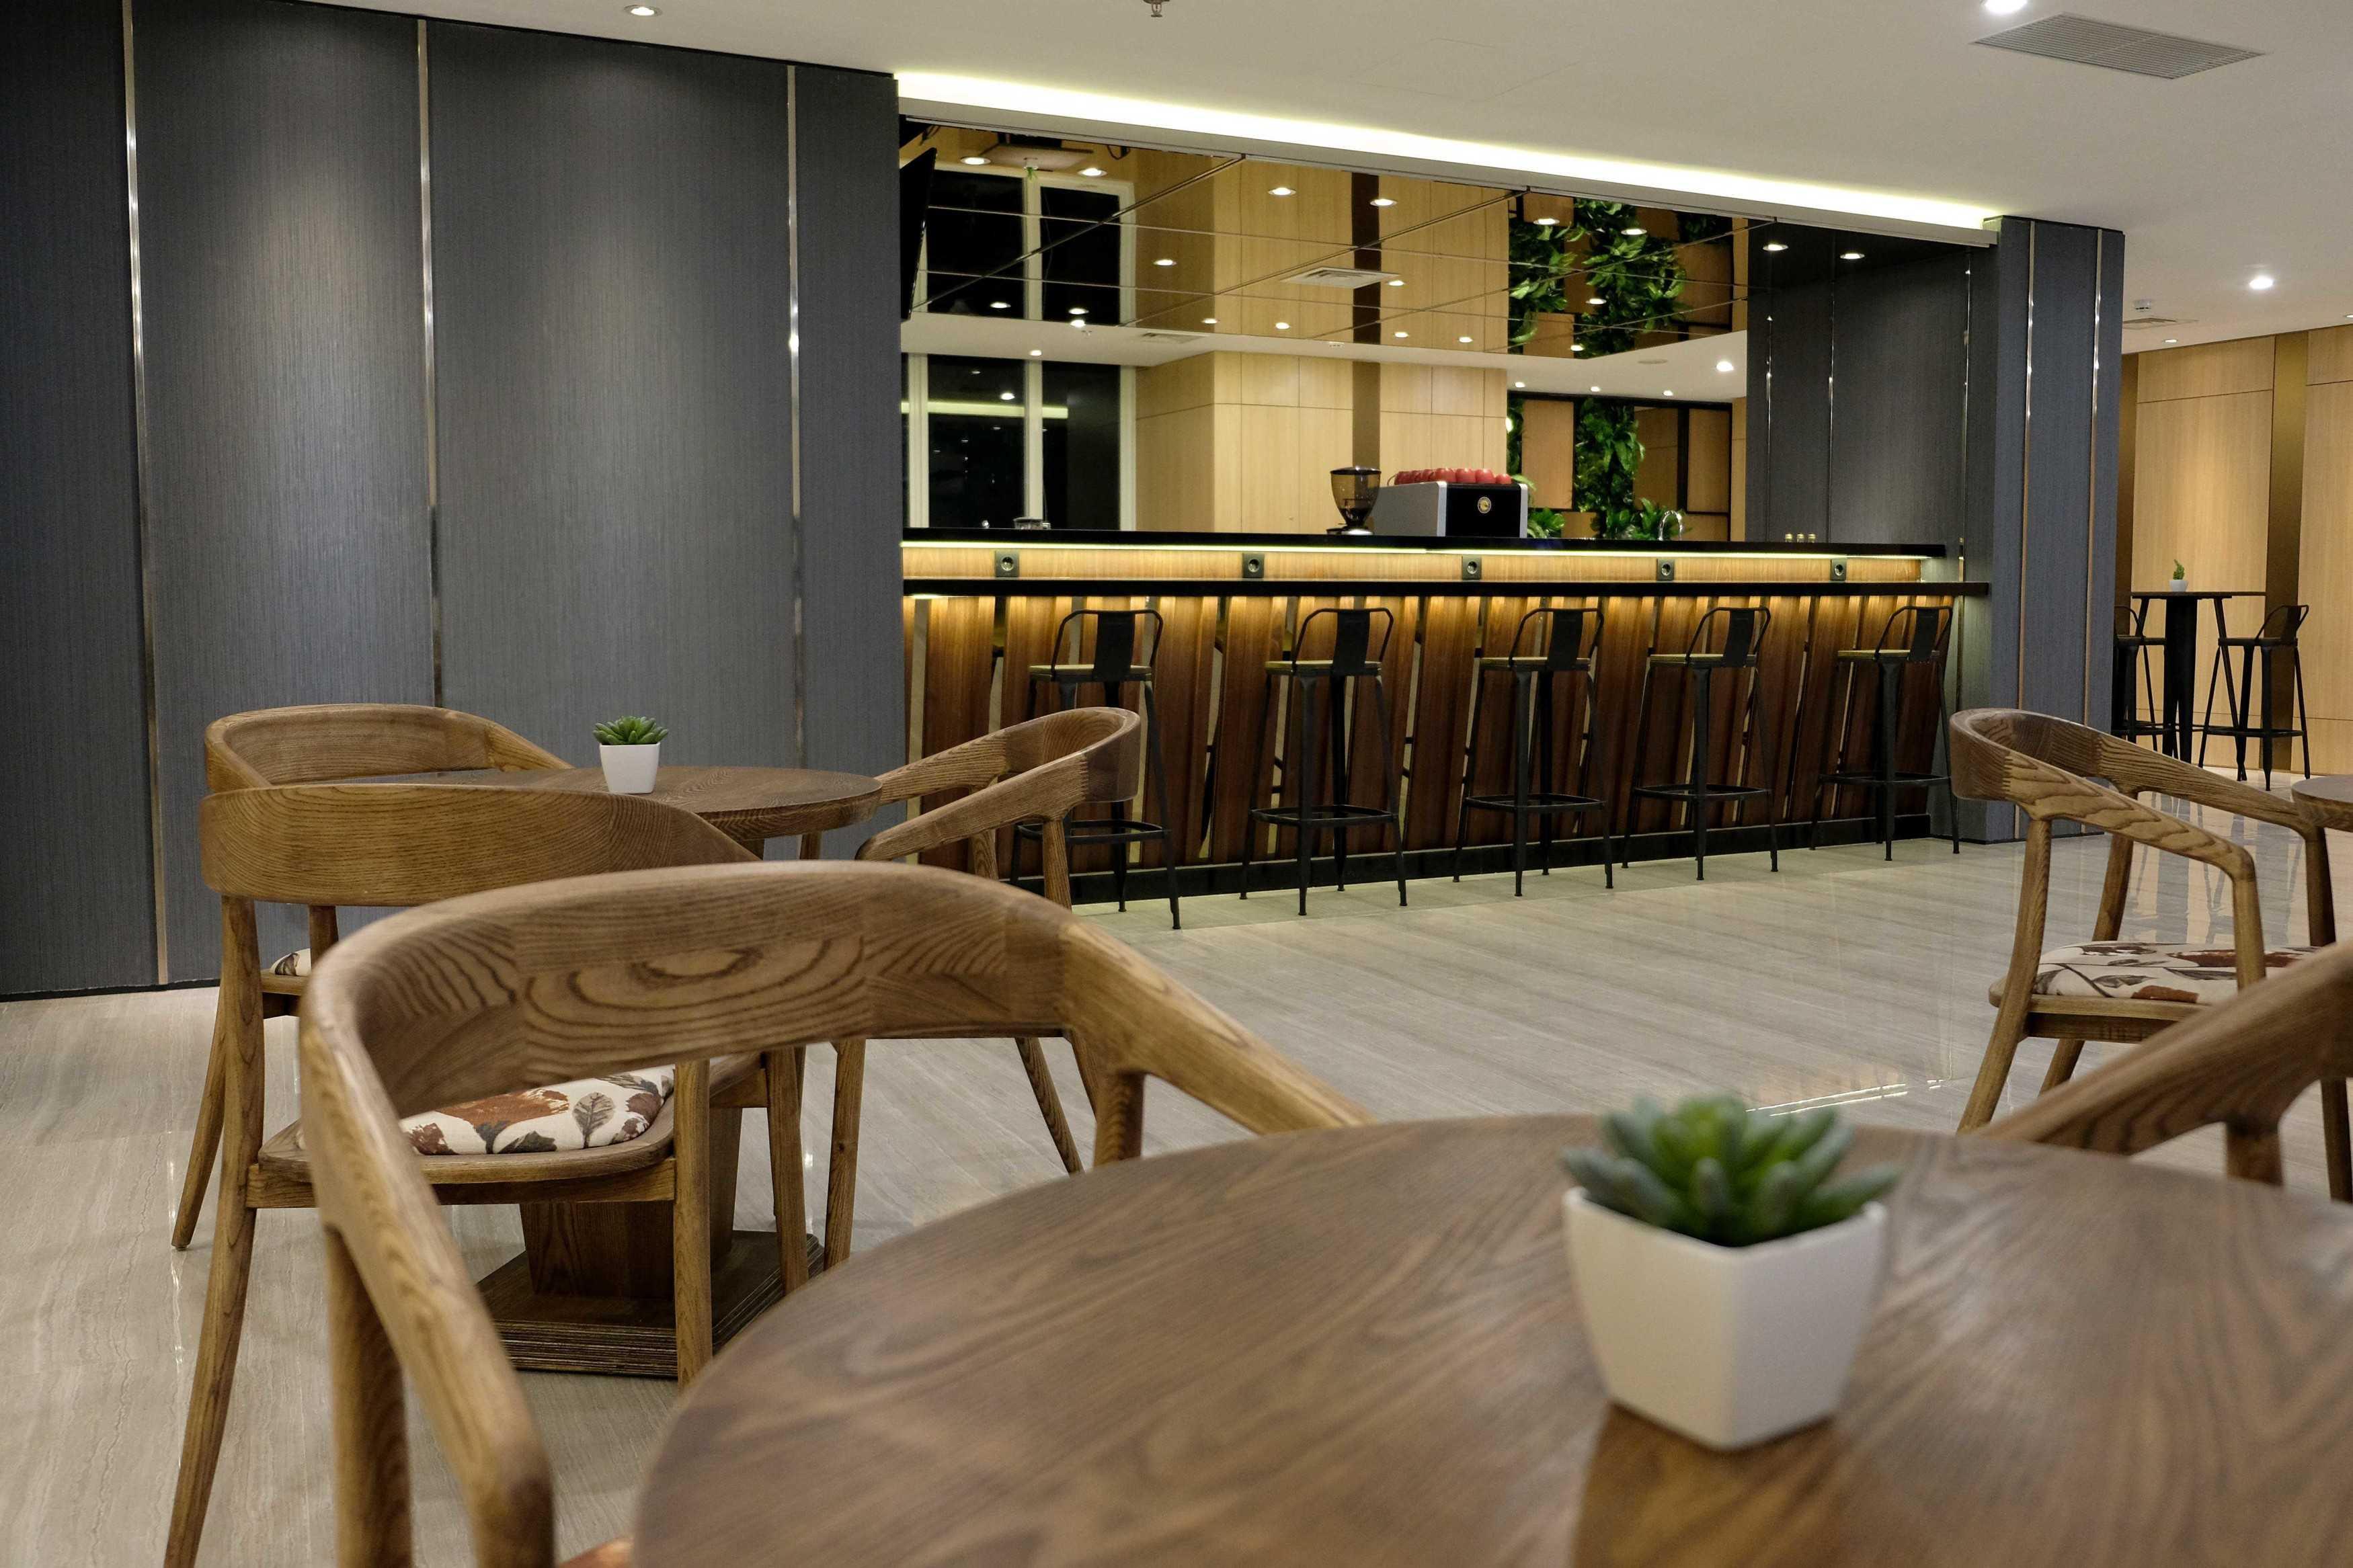 Equil Interior Hotel Dafam Pacific Caesar Surabaya, Kota Sby, Jawa Timur, Indonesia Surabaya, Kota Sby, Jawa Timur, Indonesia Equil-Interior-Hotel-Dafam-Pacific-Caesar   53778